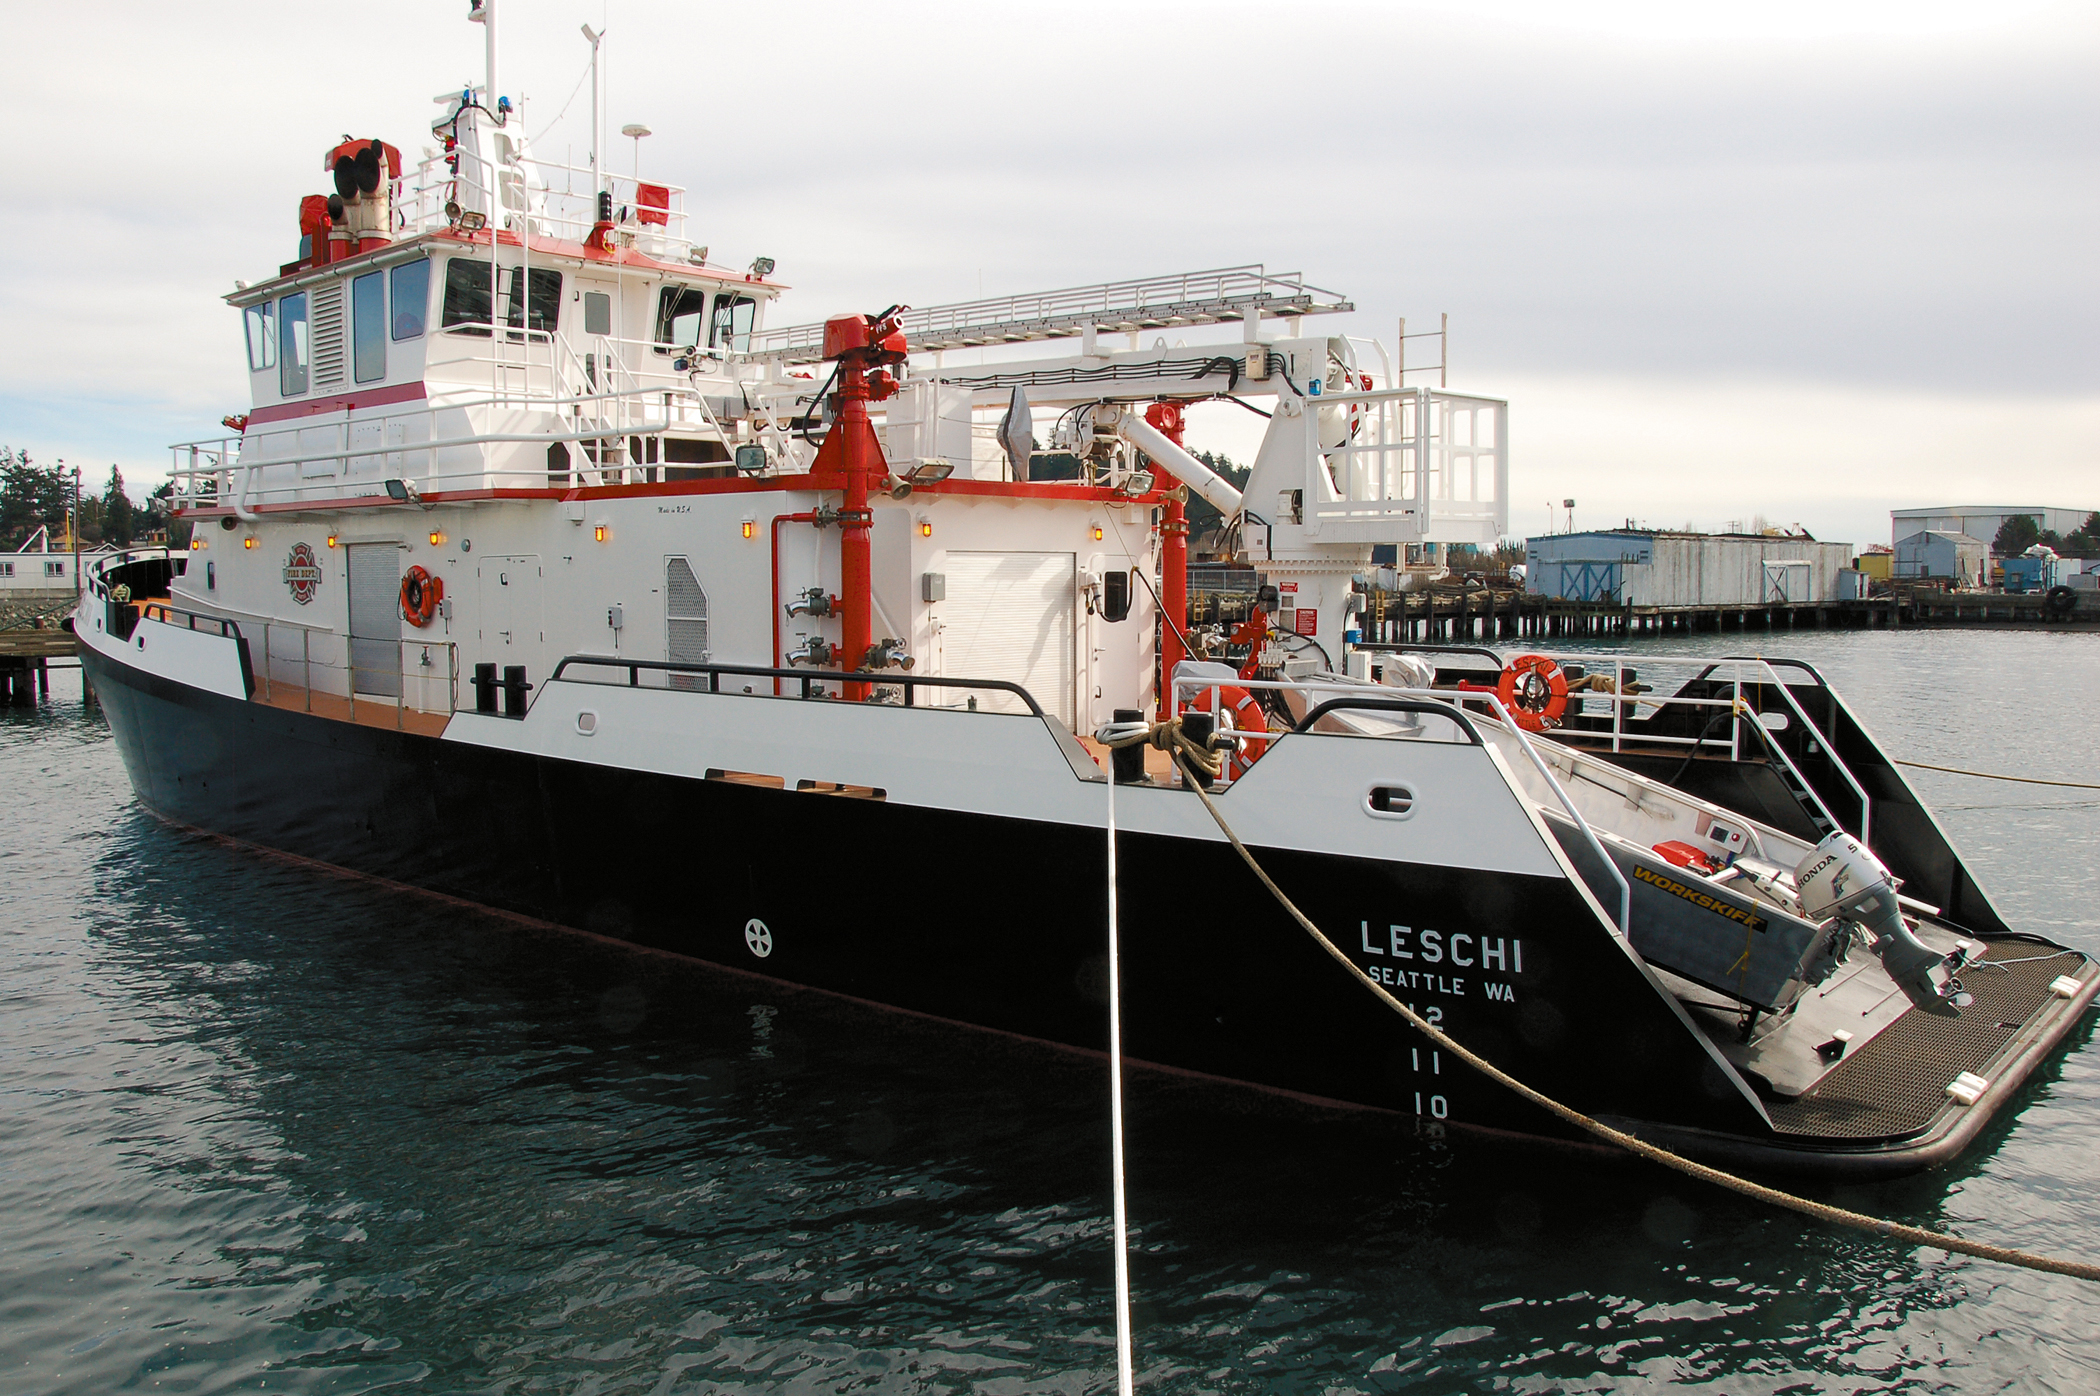 seattlefireboat.jpg